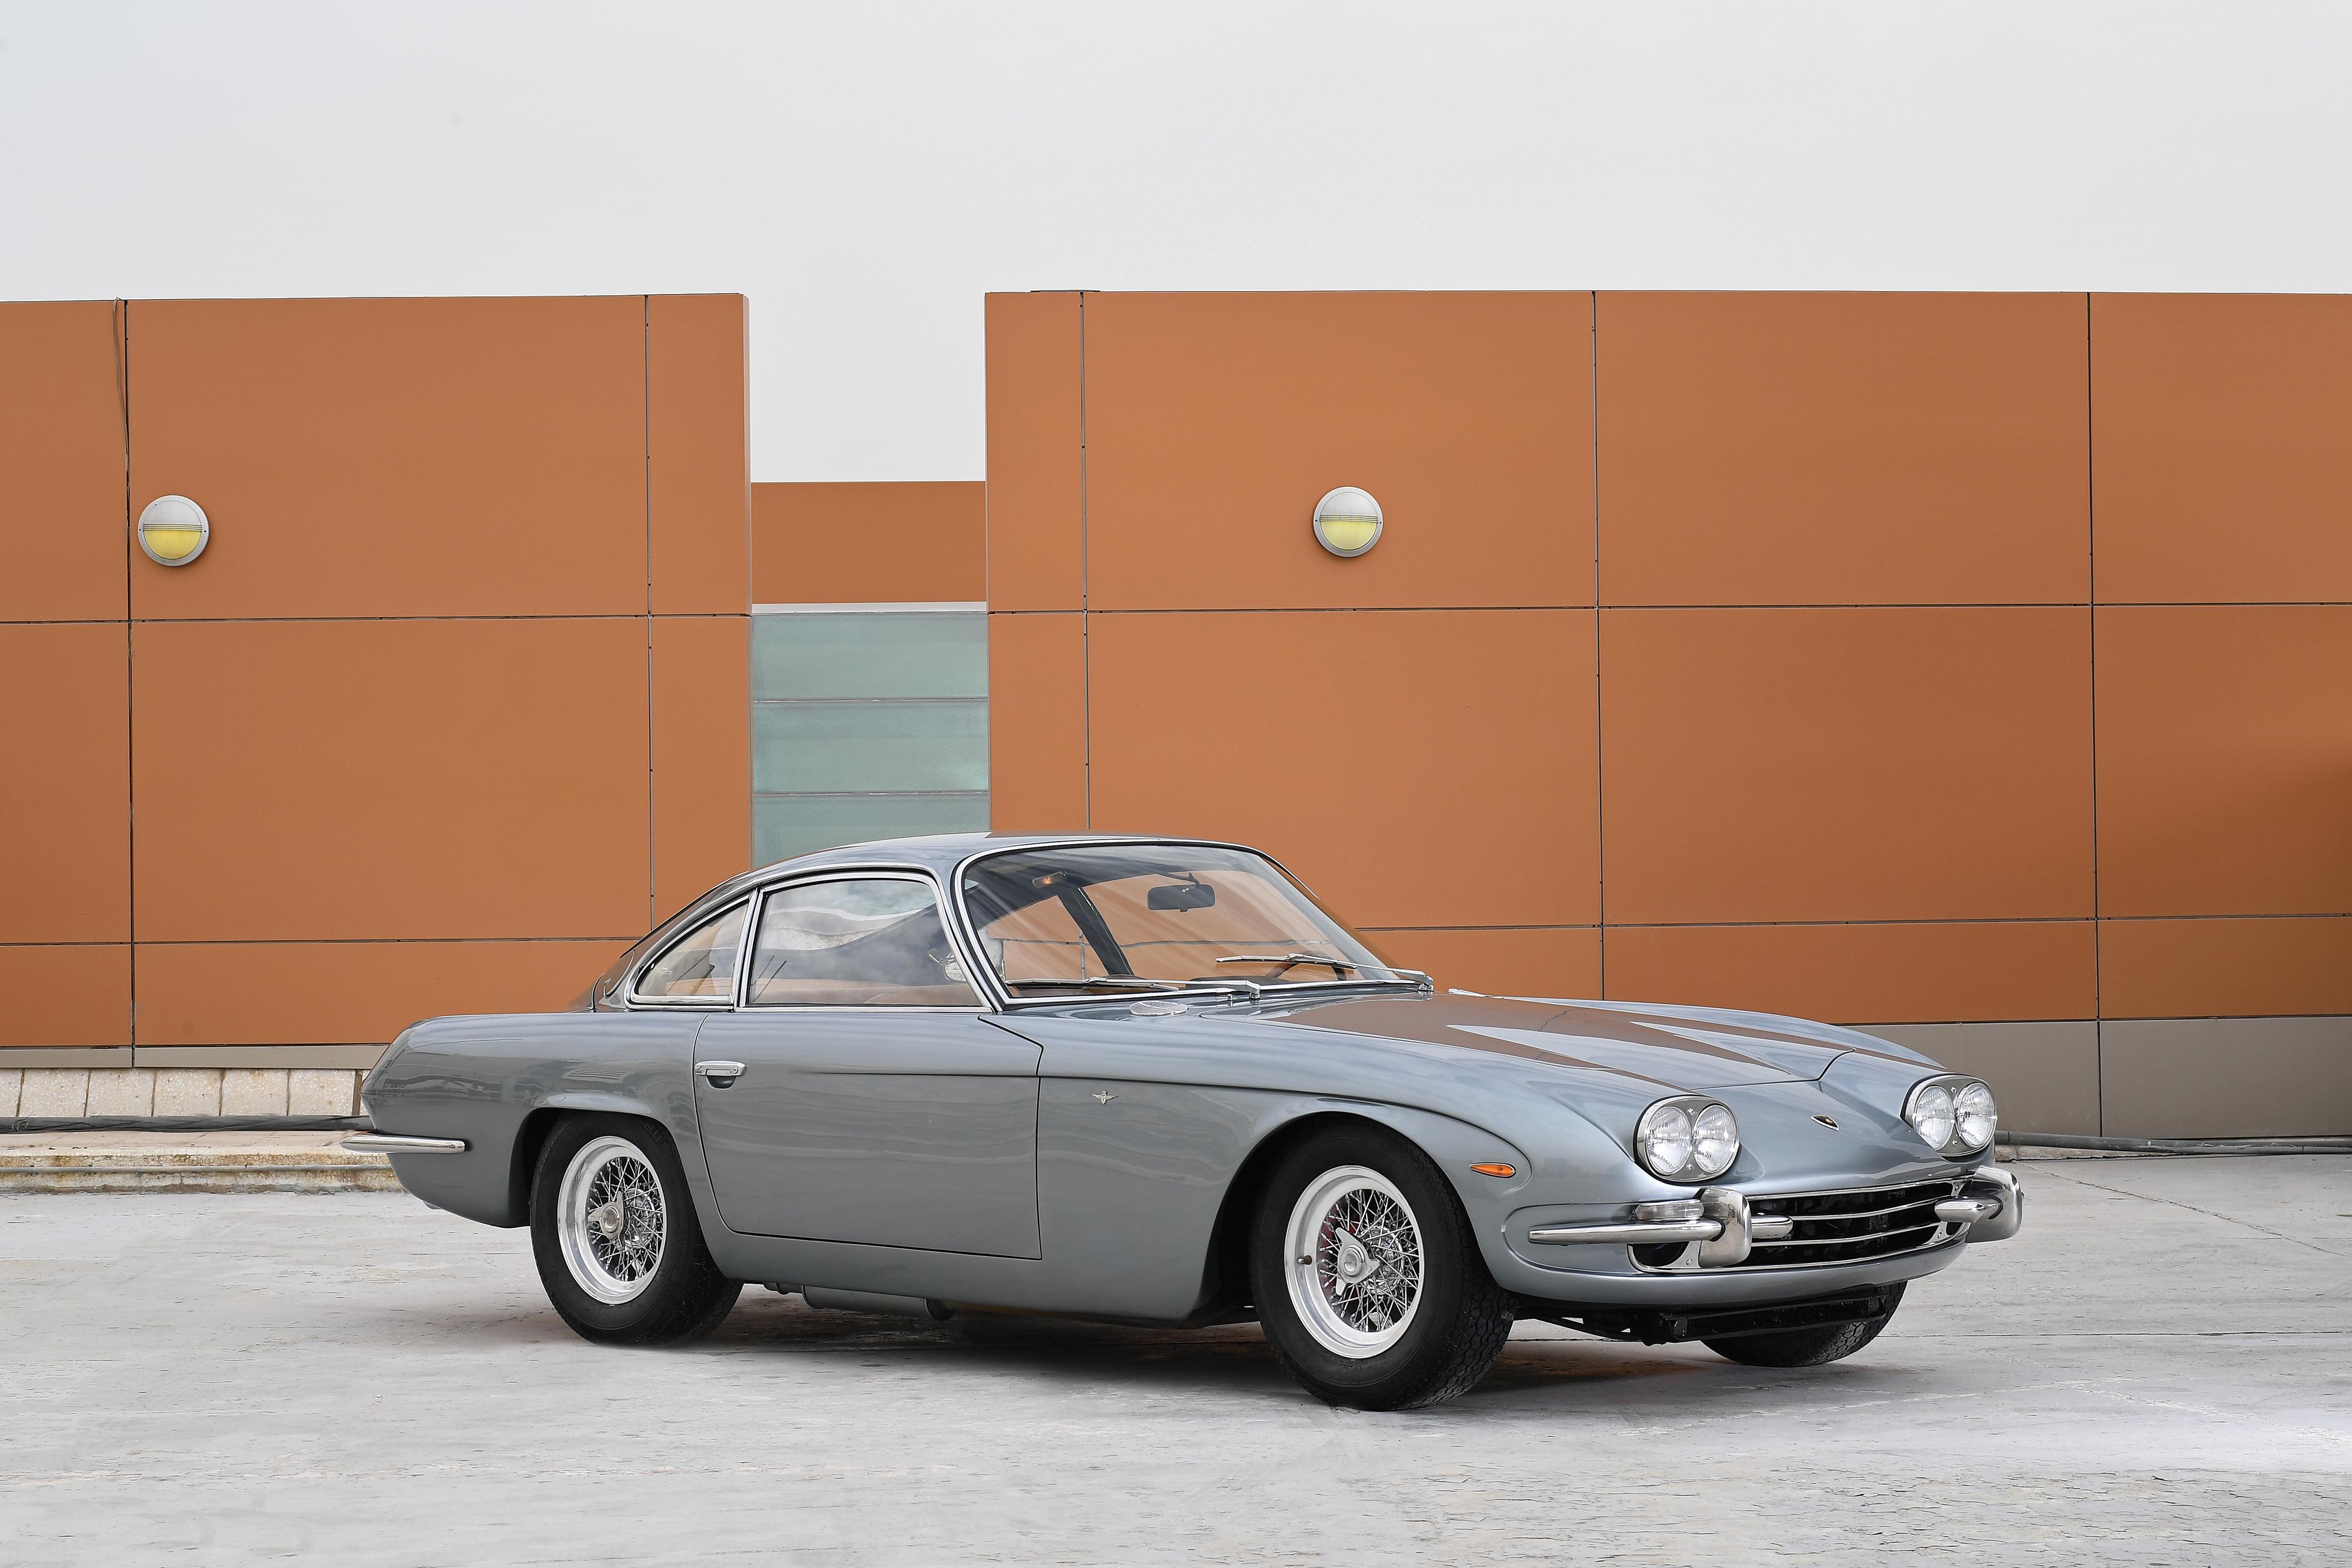 1967 Lamborghini 400 Gt Values Hagerty Valuation Tool